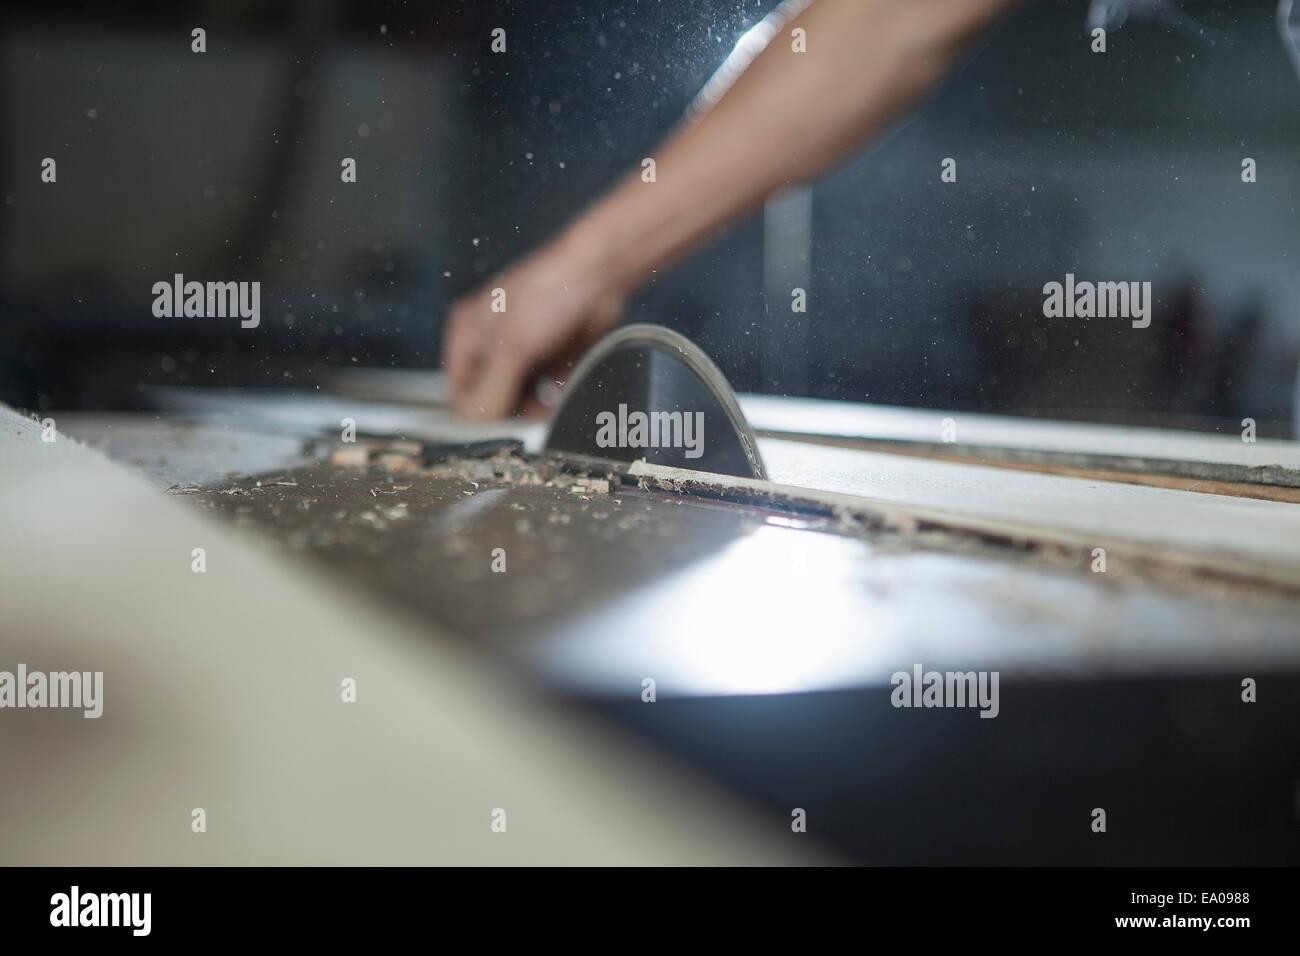 Tischler schneiden Holzbohle mit Elektrosäge in Fabrik, Jiangsu, China Stockbild